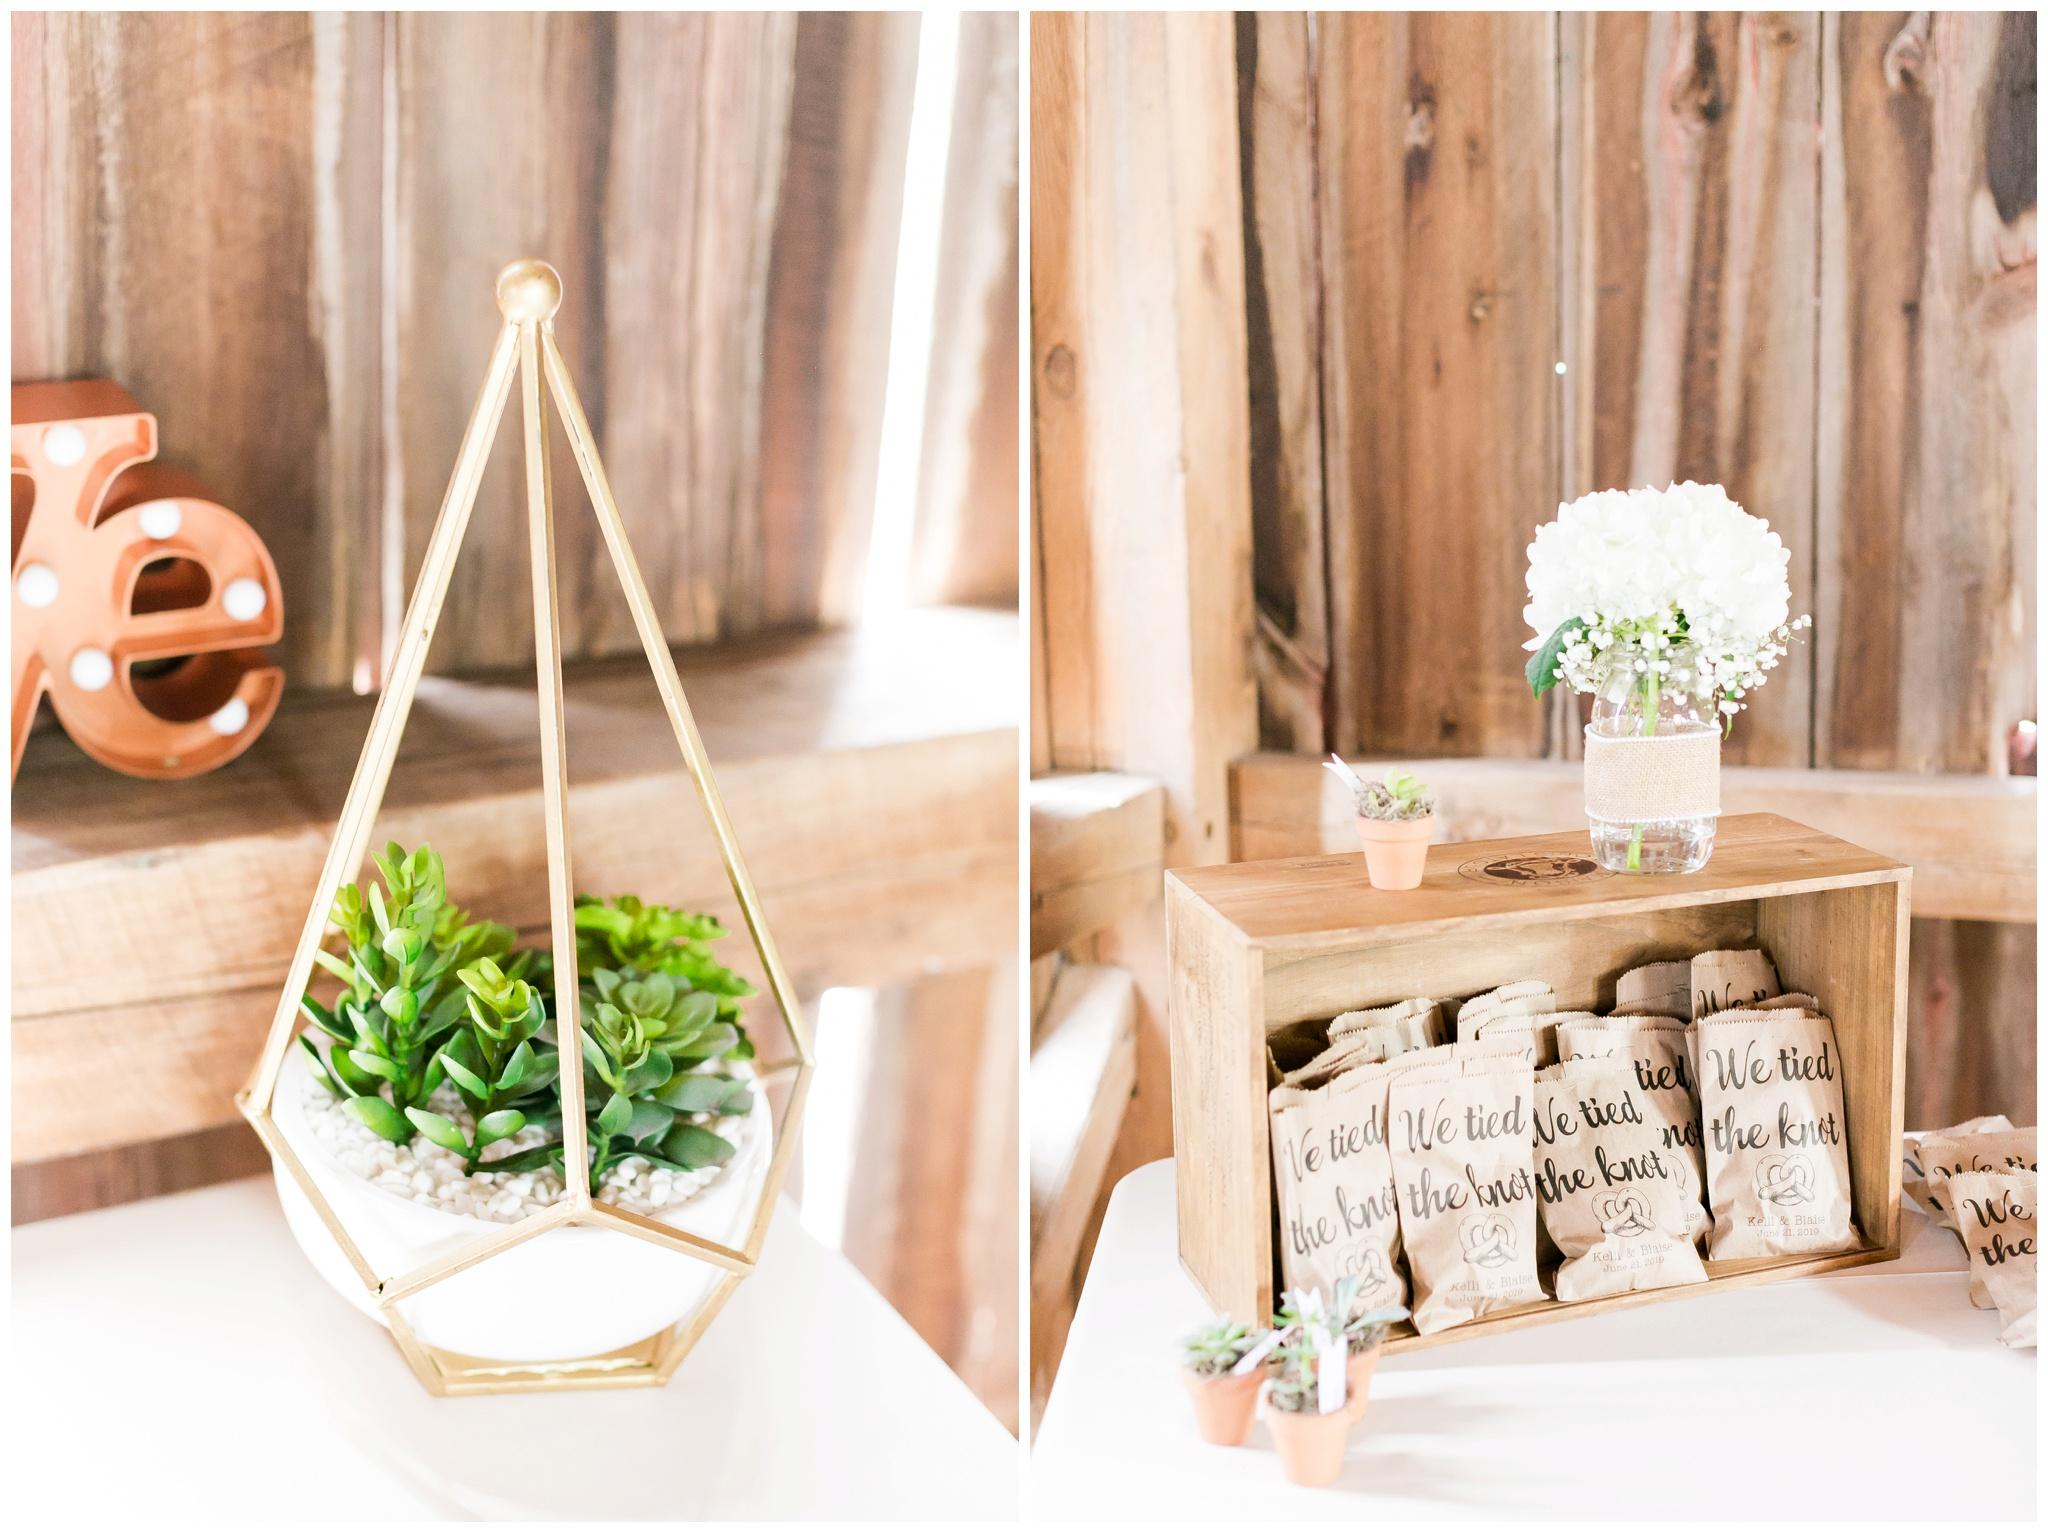 over_the_vines_wedding_edgerton_wisconsin_wedding_caynay_photo_4016.jpg